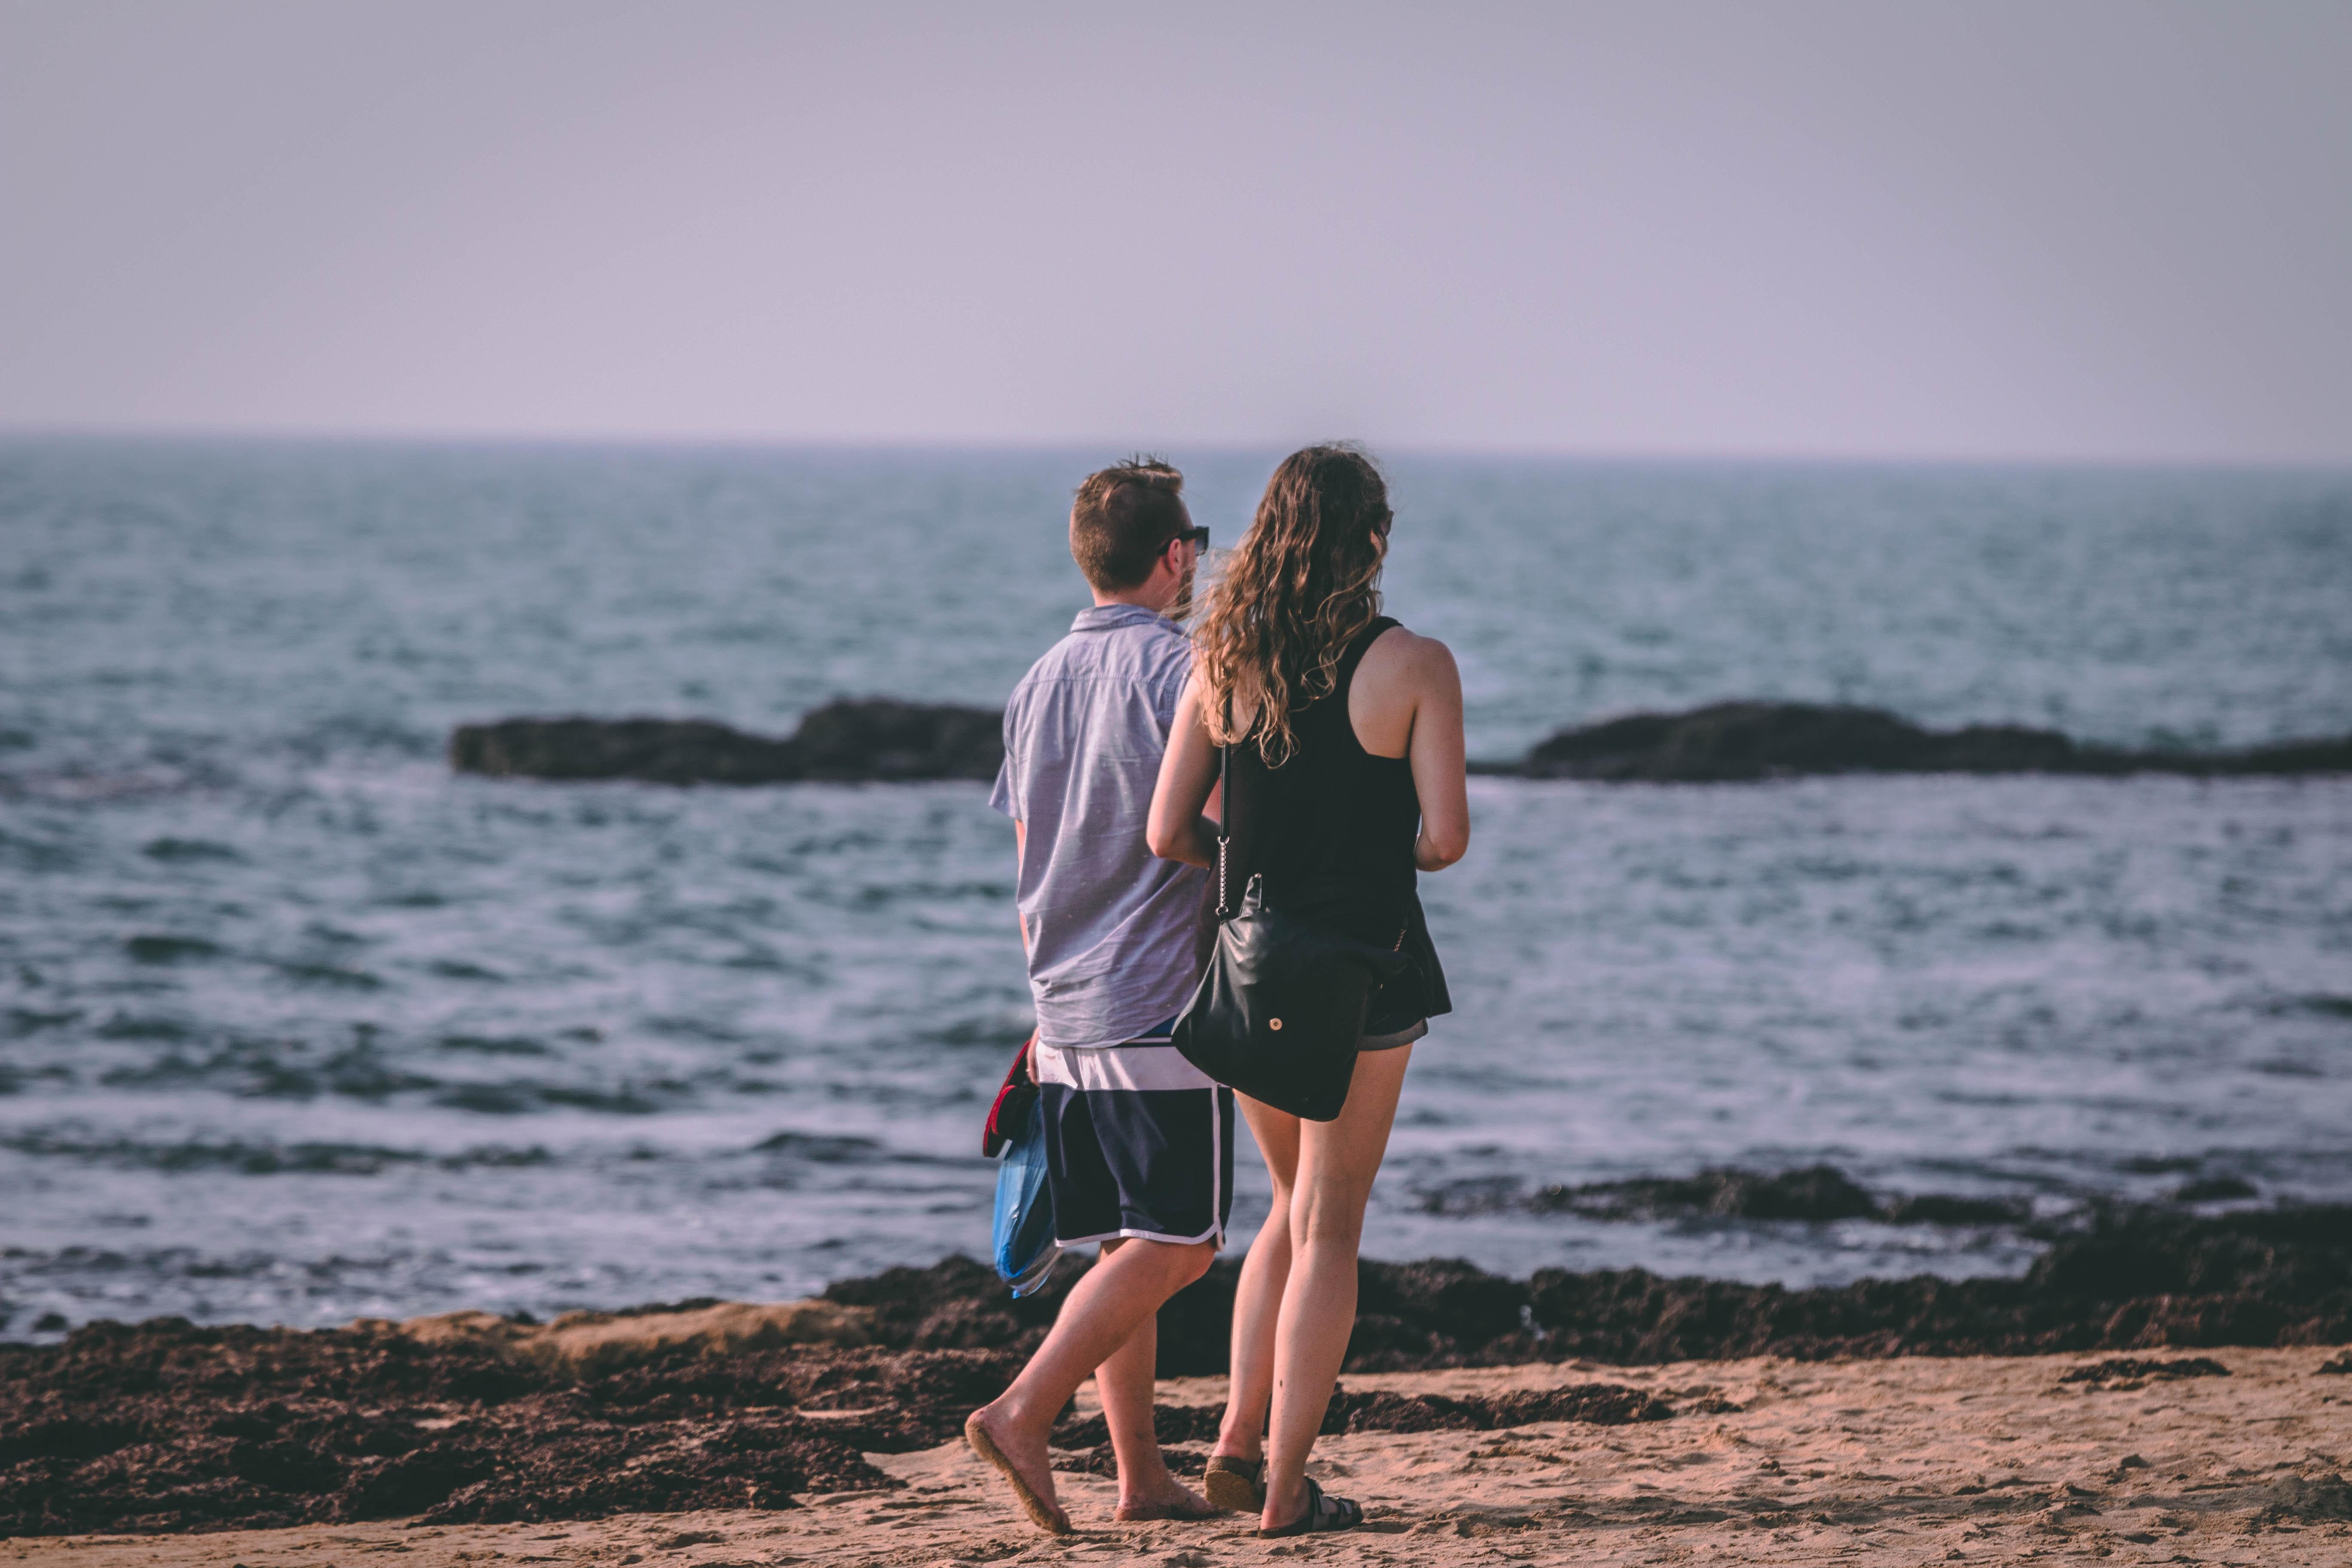 Woman and man walking near seashore photo